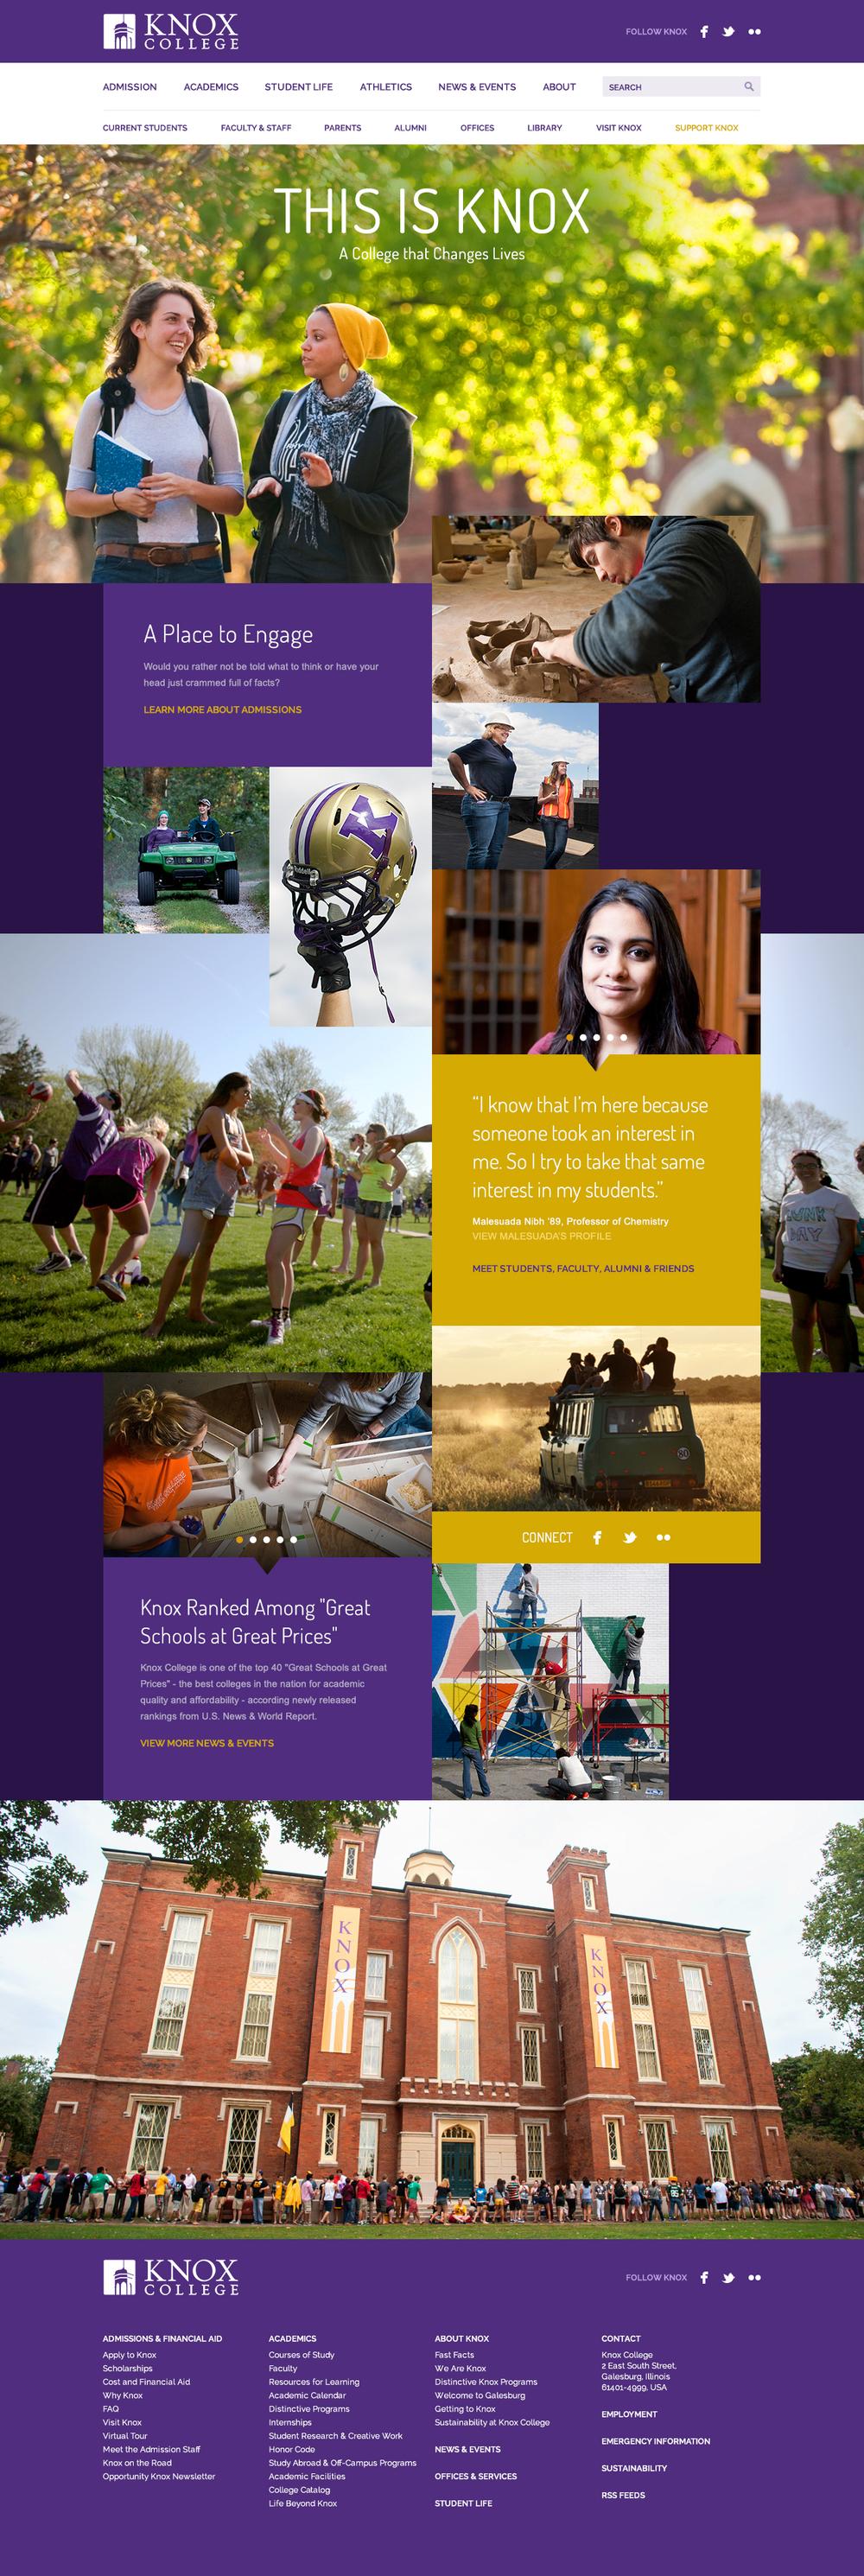 Knox College Academic Calendar.Knox College Vice Vision